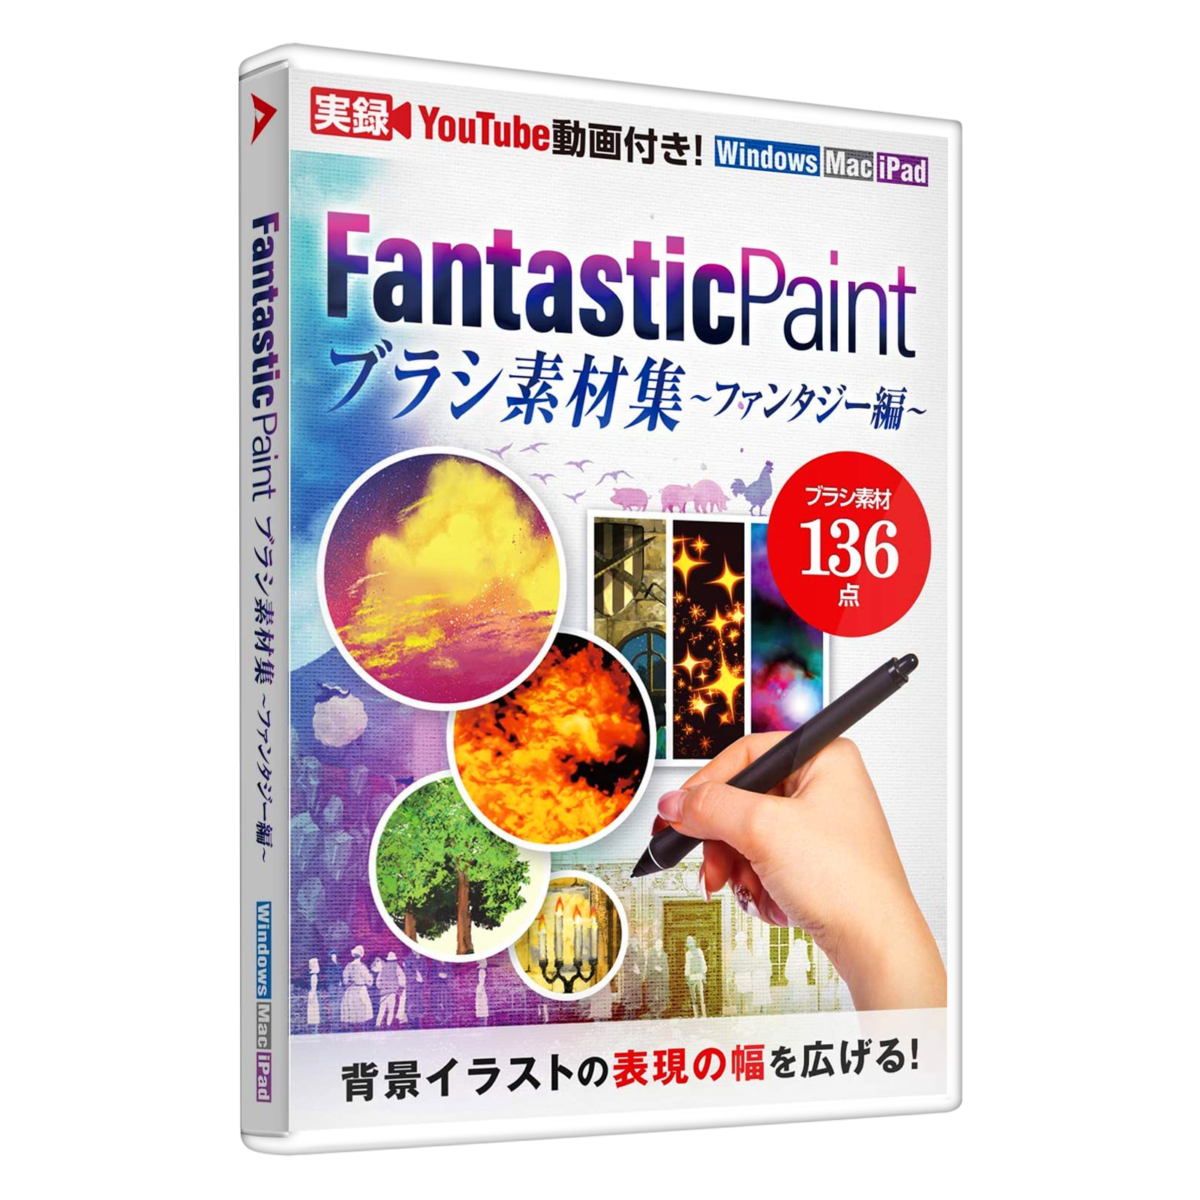 Fantastic Paint ブラシ素材集~ファンタジー編~